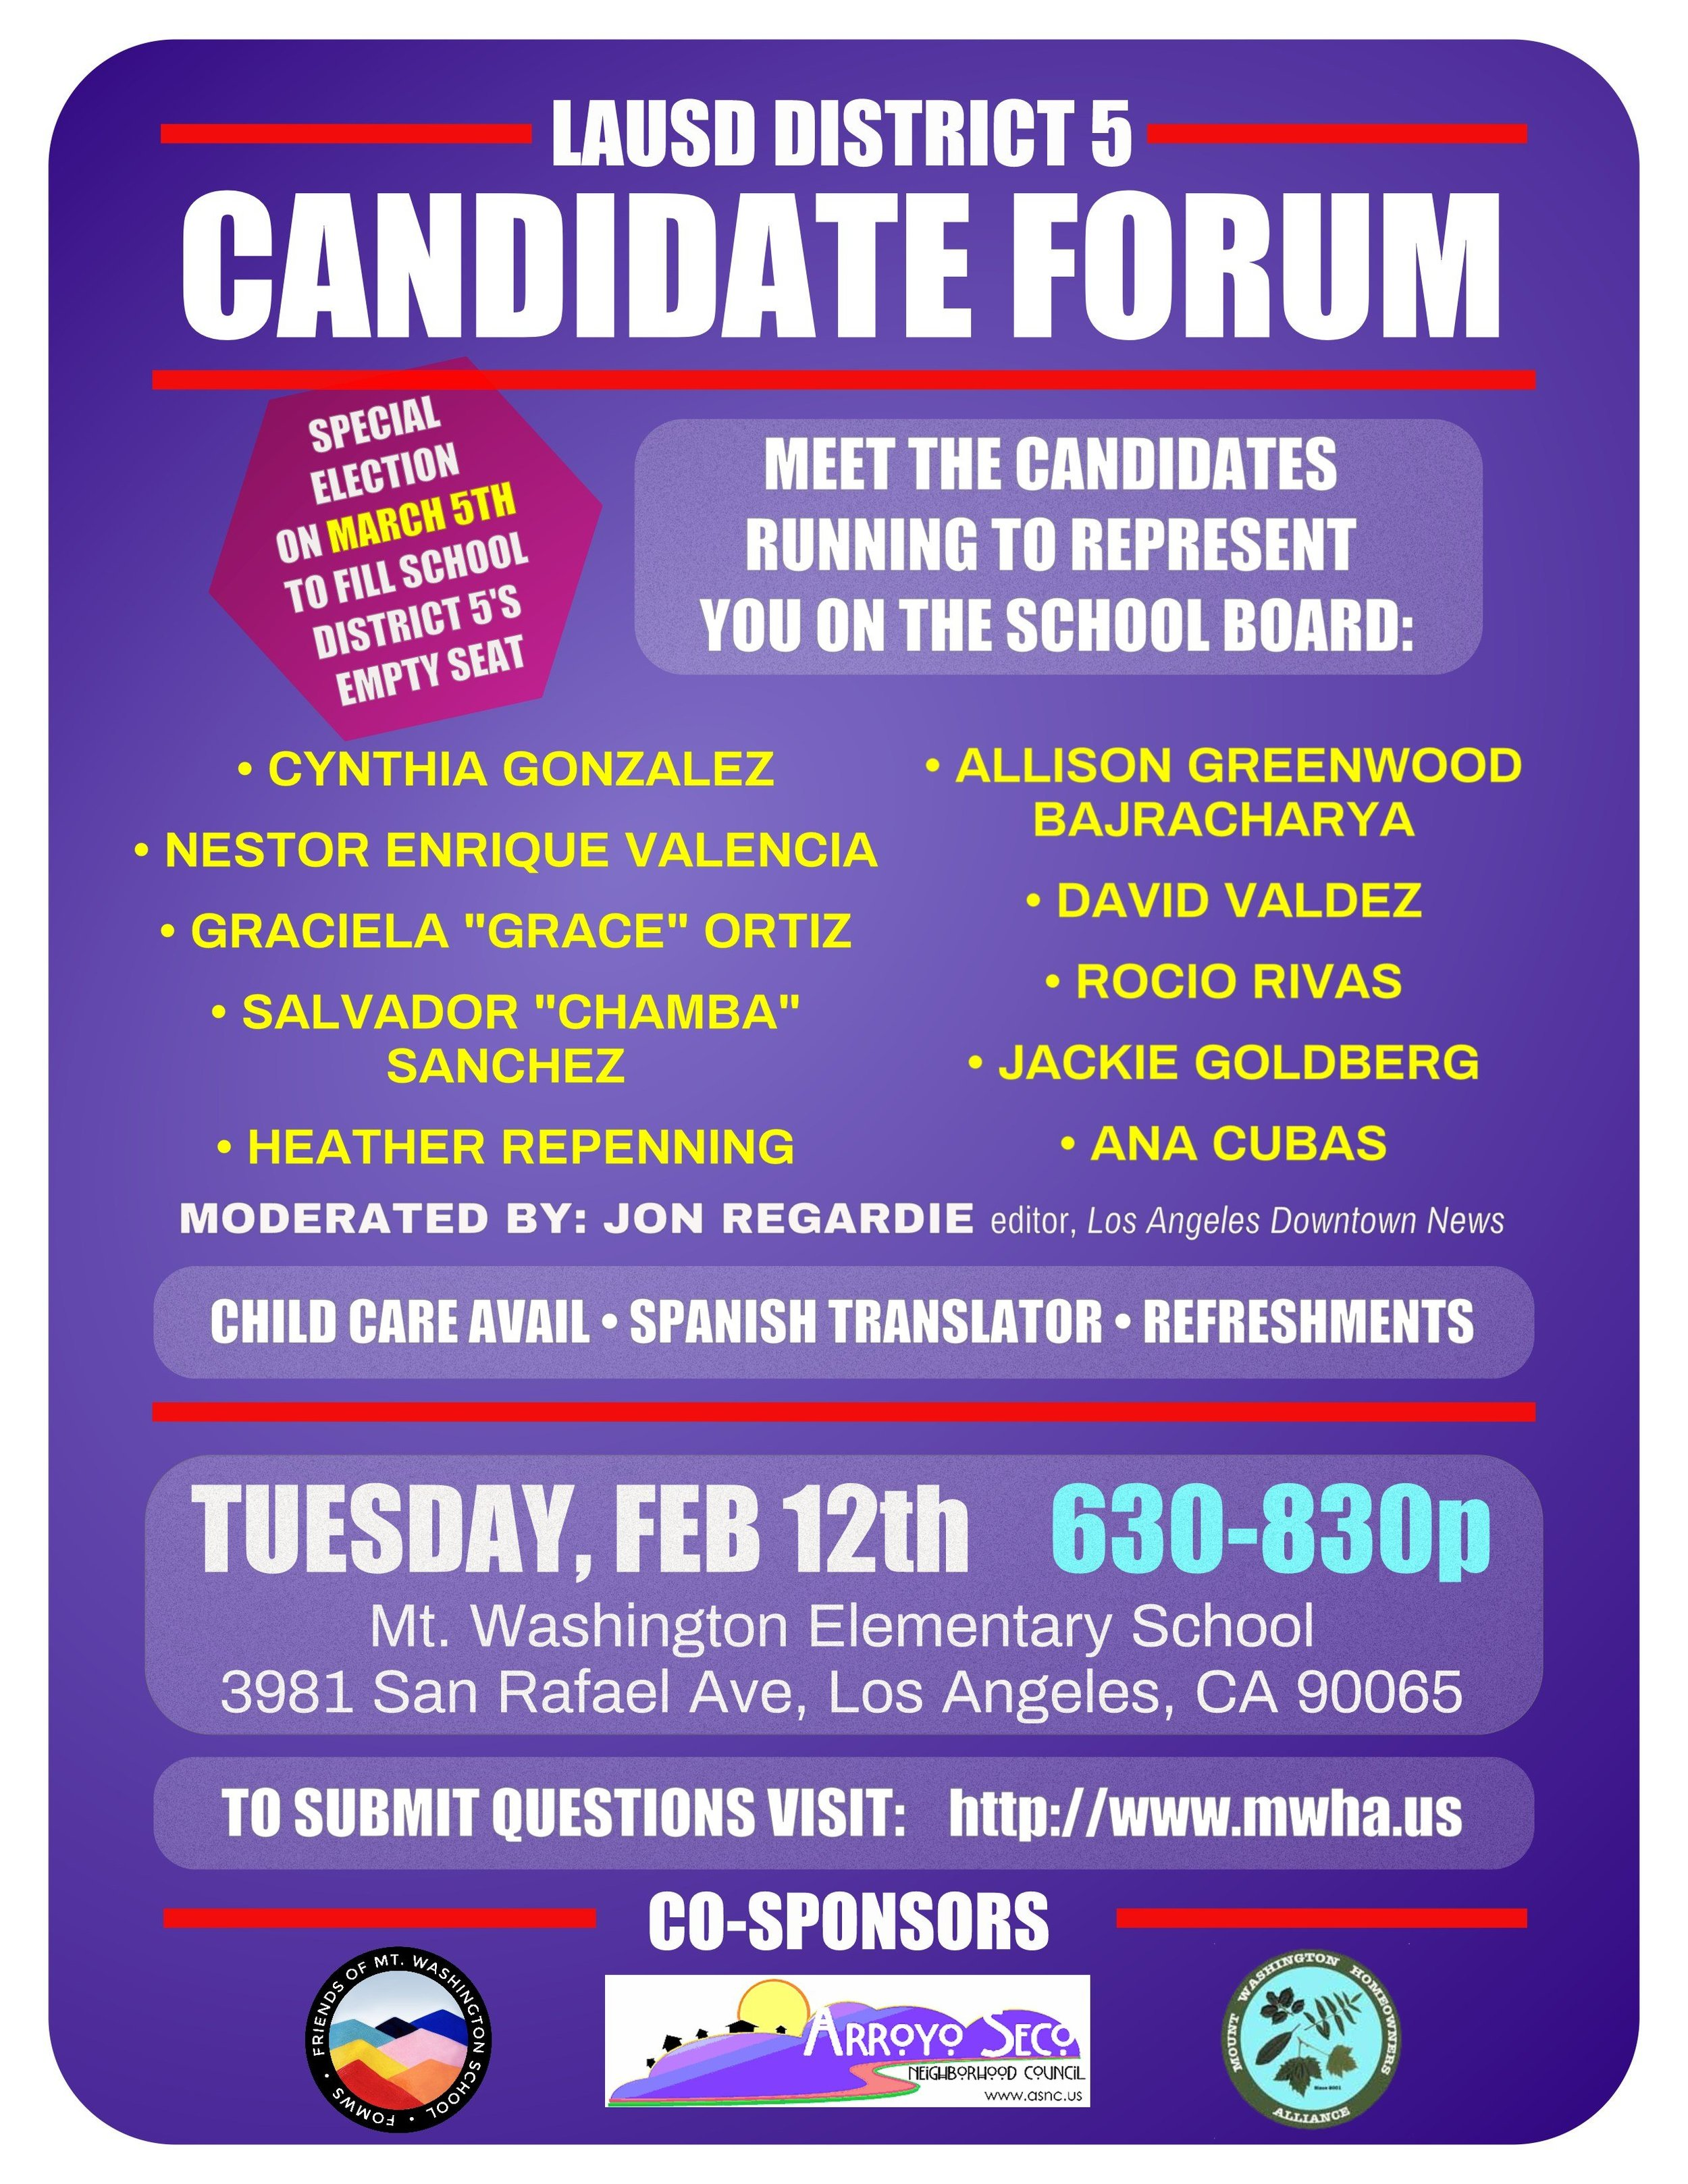 Candidate Forum flyer.jpeg